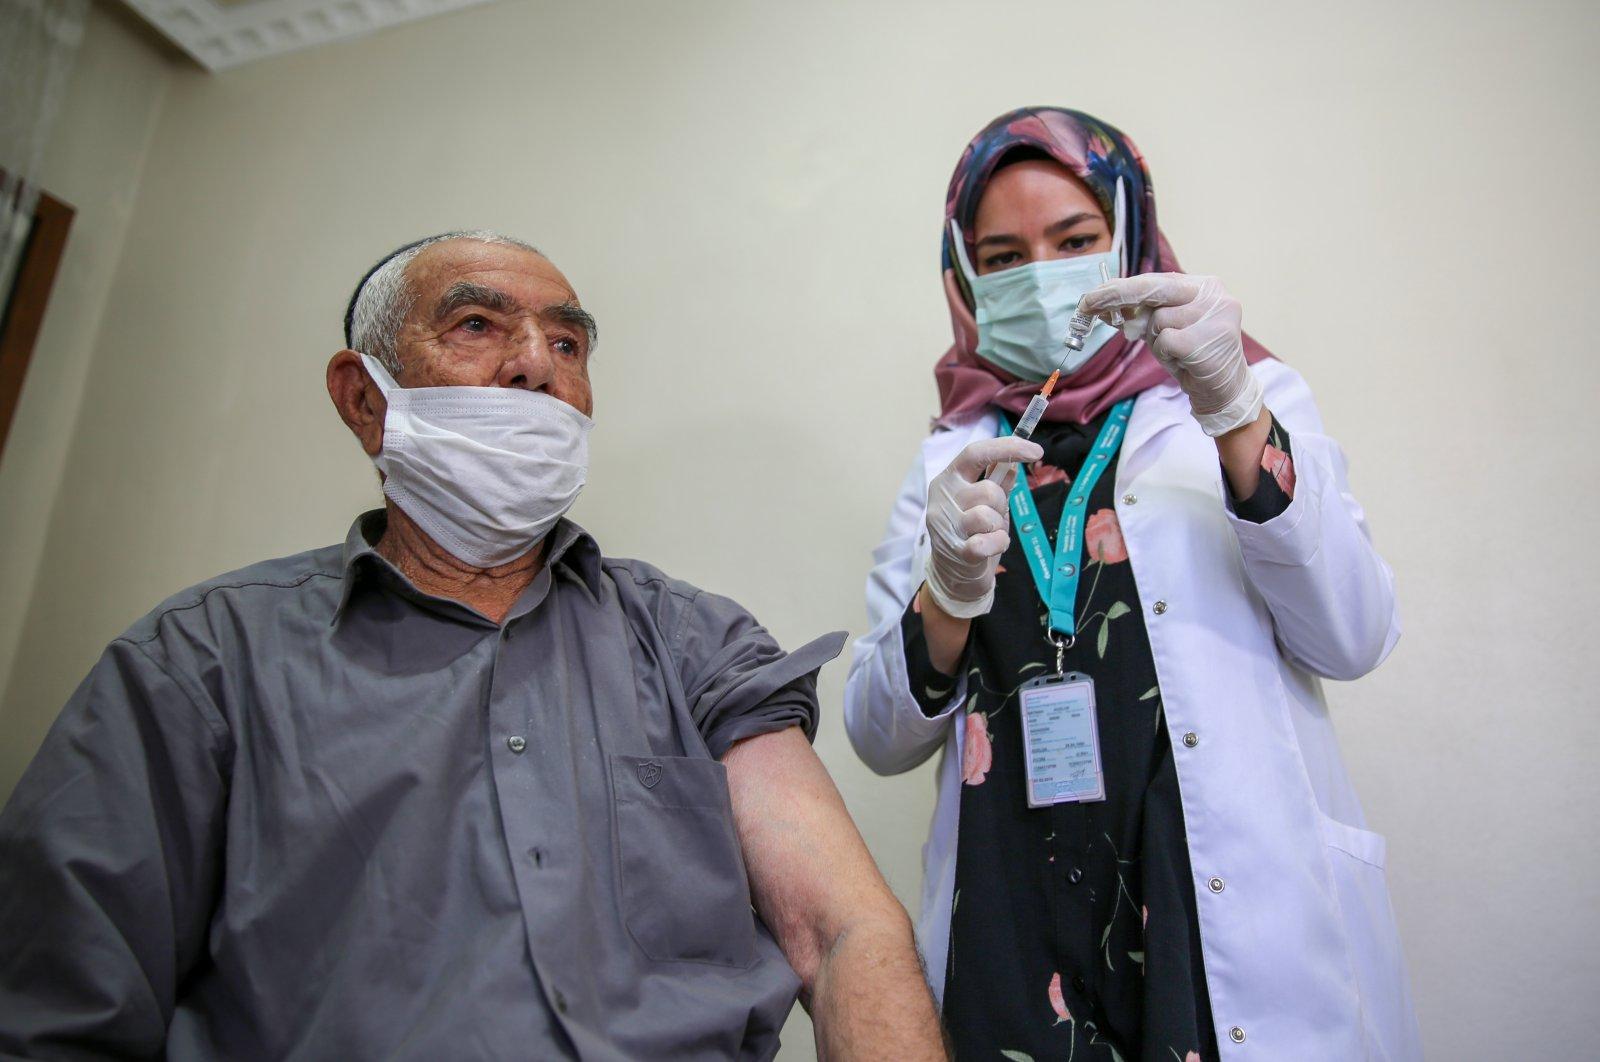 A health care worker readies a COVID-19 jab for 90-year-old Ahmet Gündoğdu, in Diyarbakır, southeastern Turkey, June 3, 2021. (AA PHOTO)